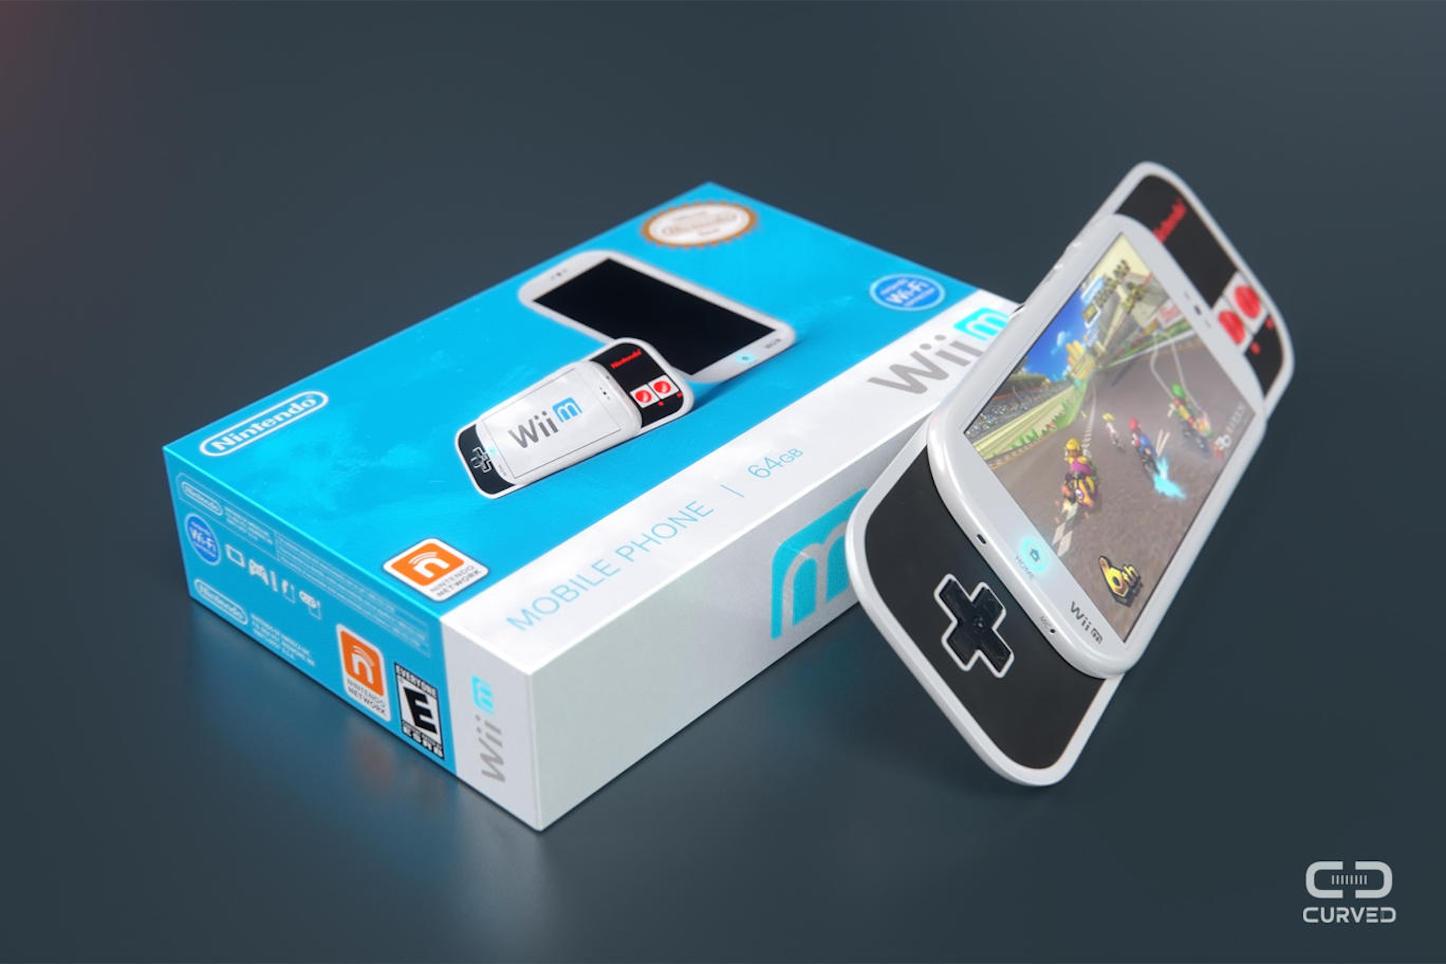 Nintendo SmartPhone Concept